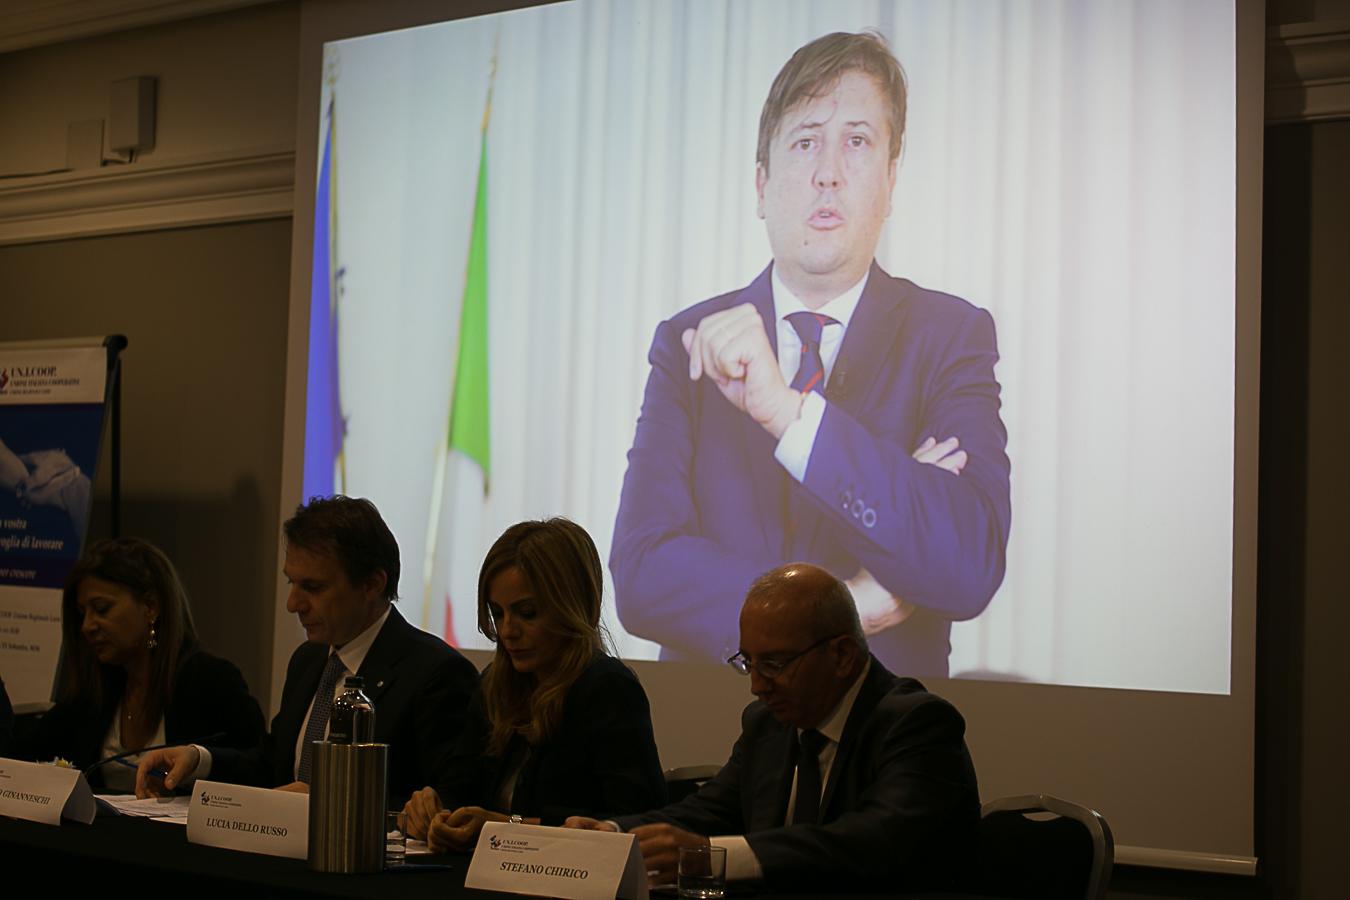 Pier Paolo Silerijpg